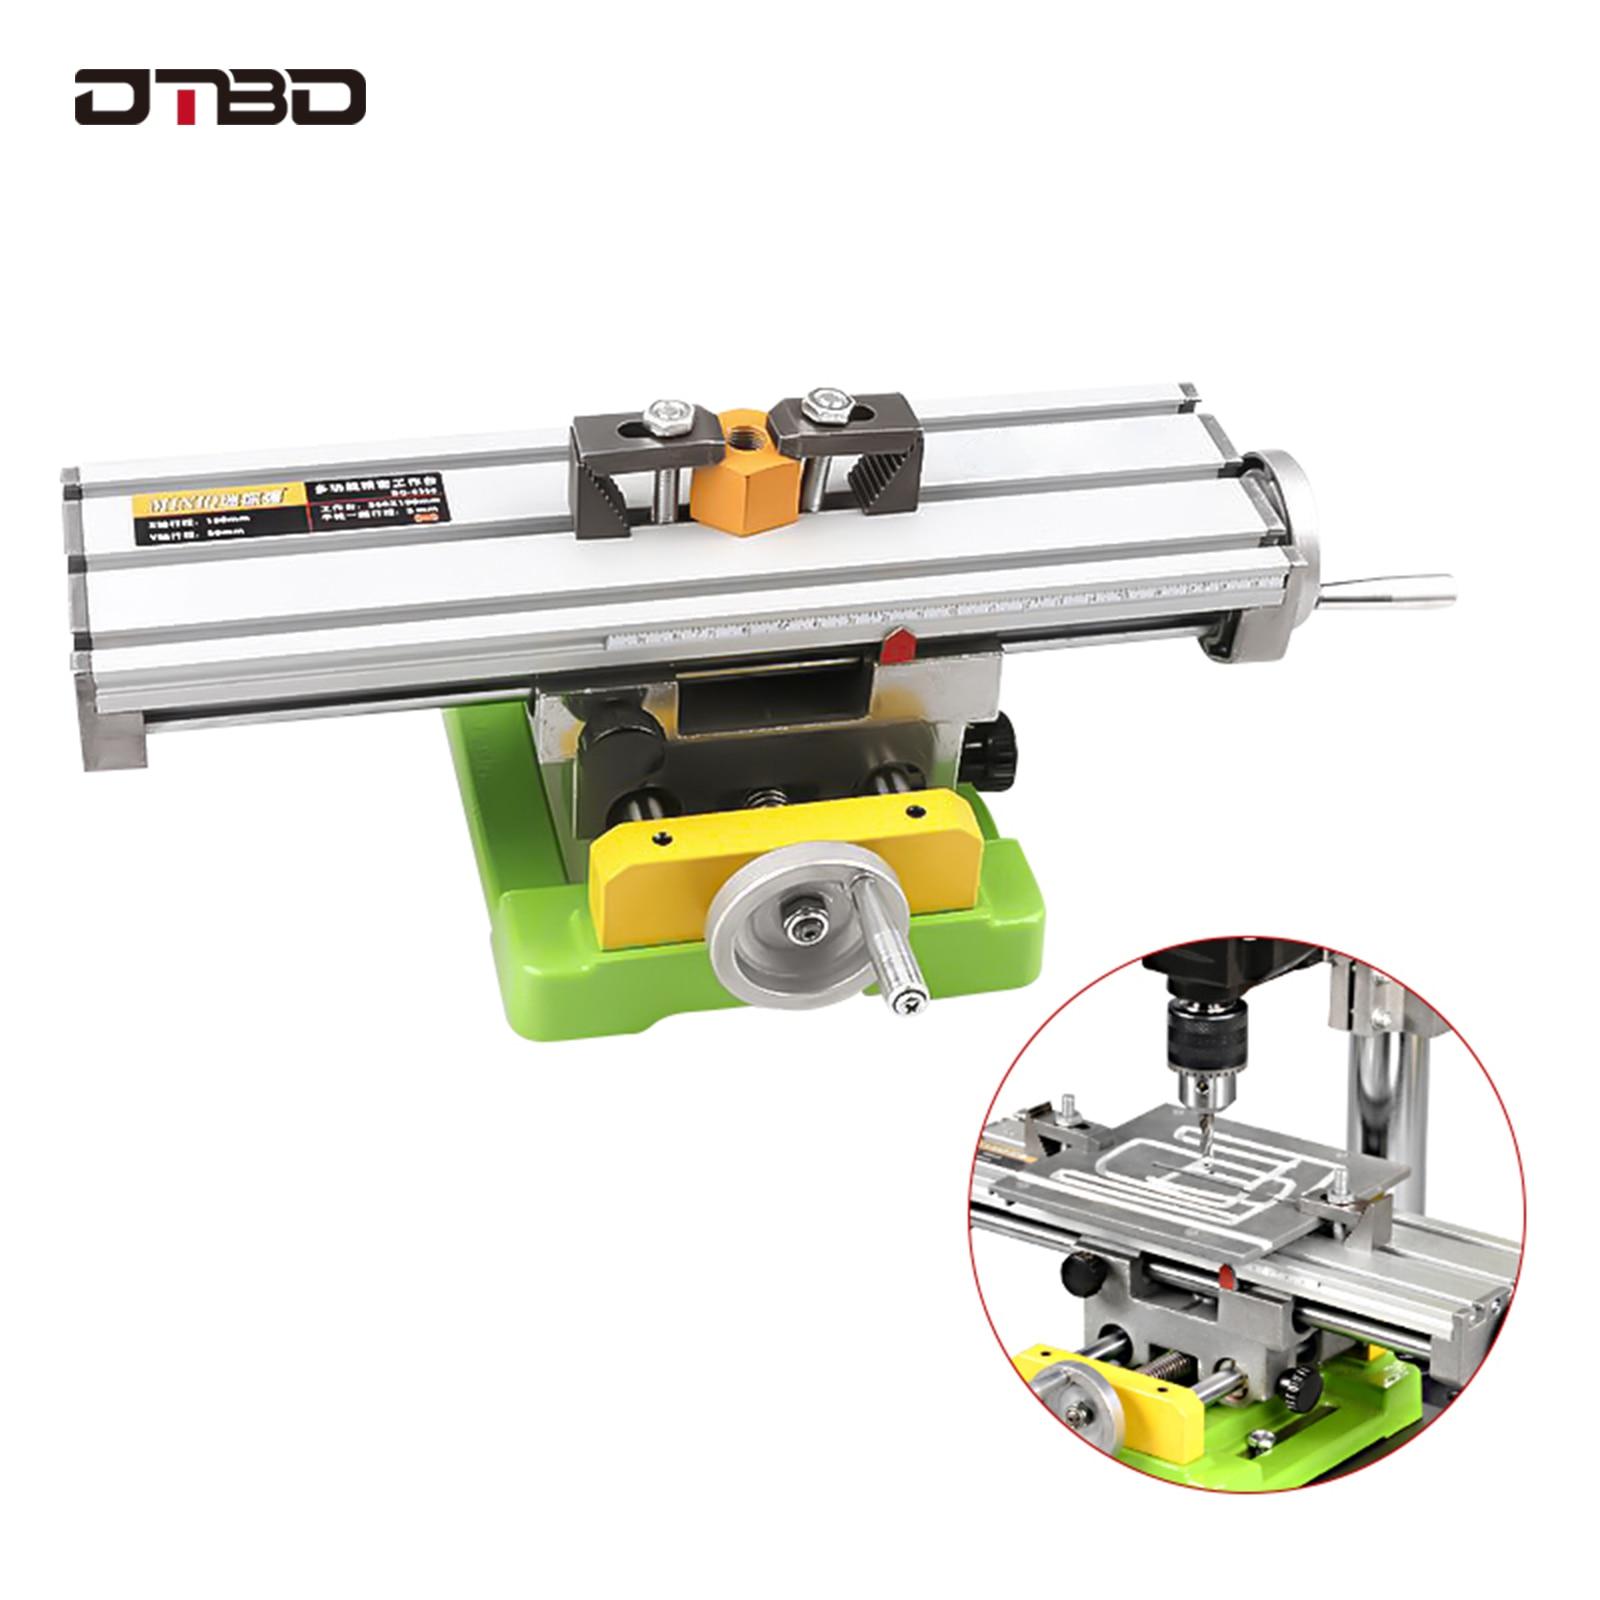 MINIQ Multifunction Drill Vise Fixture Working Table Mini Precision Milling Machine Worktable